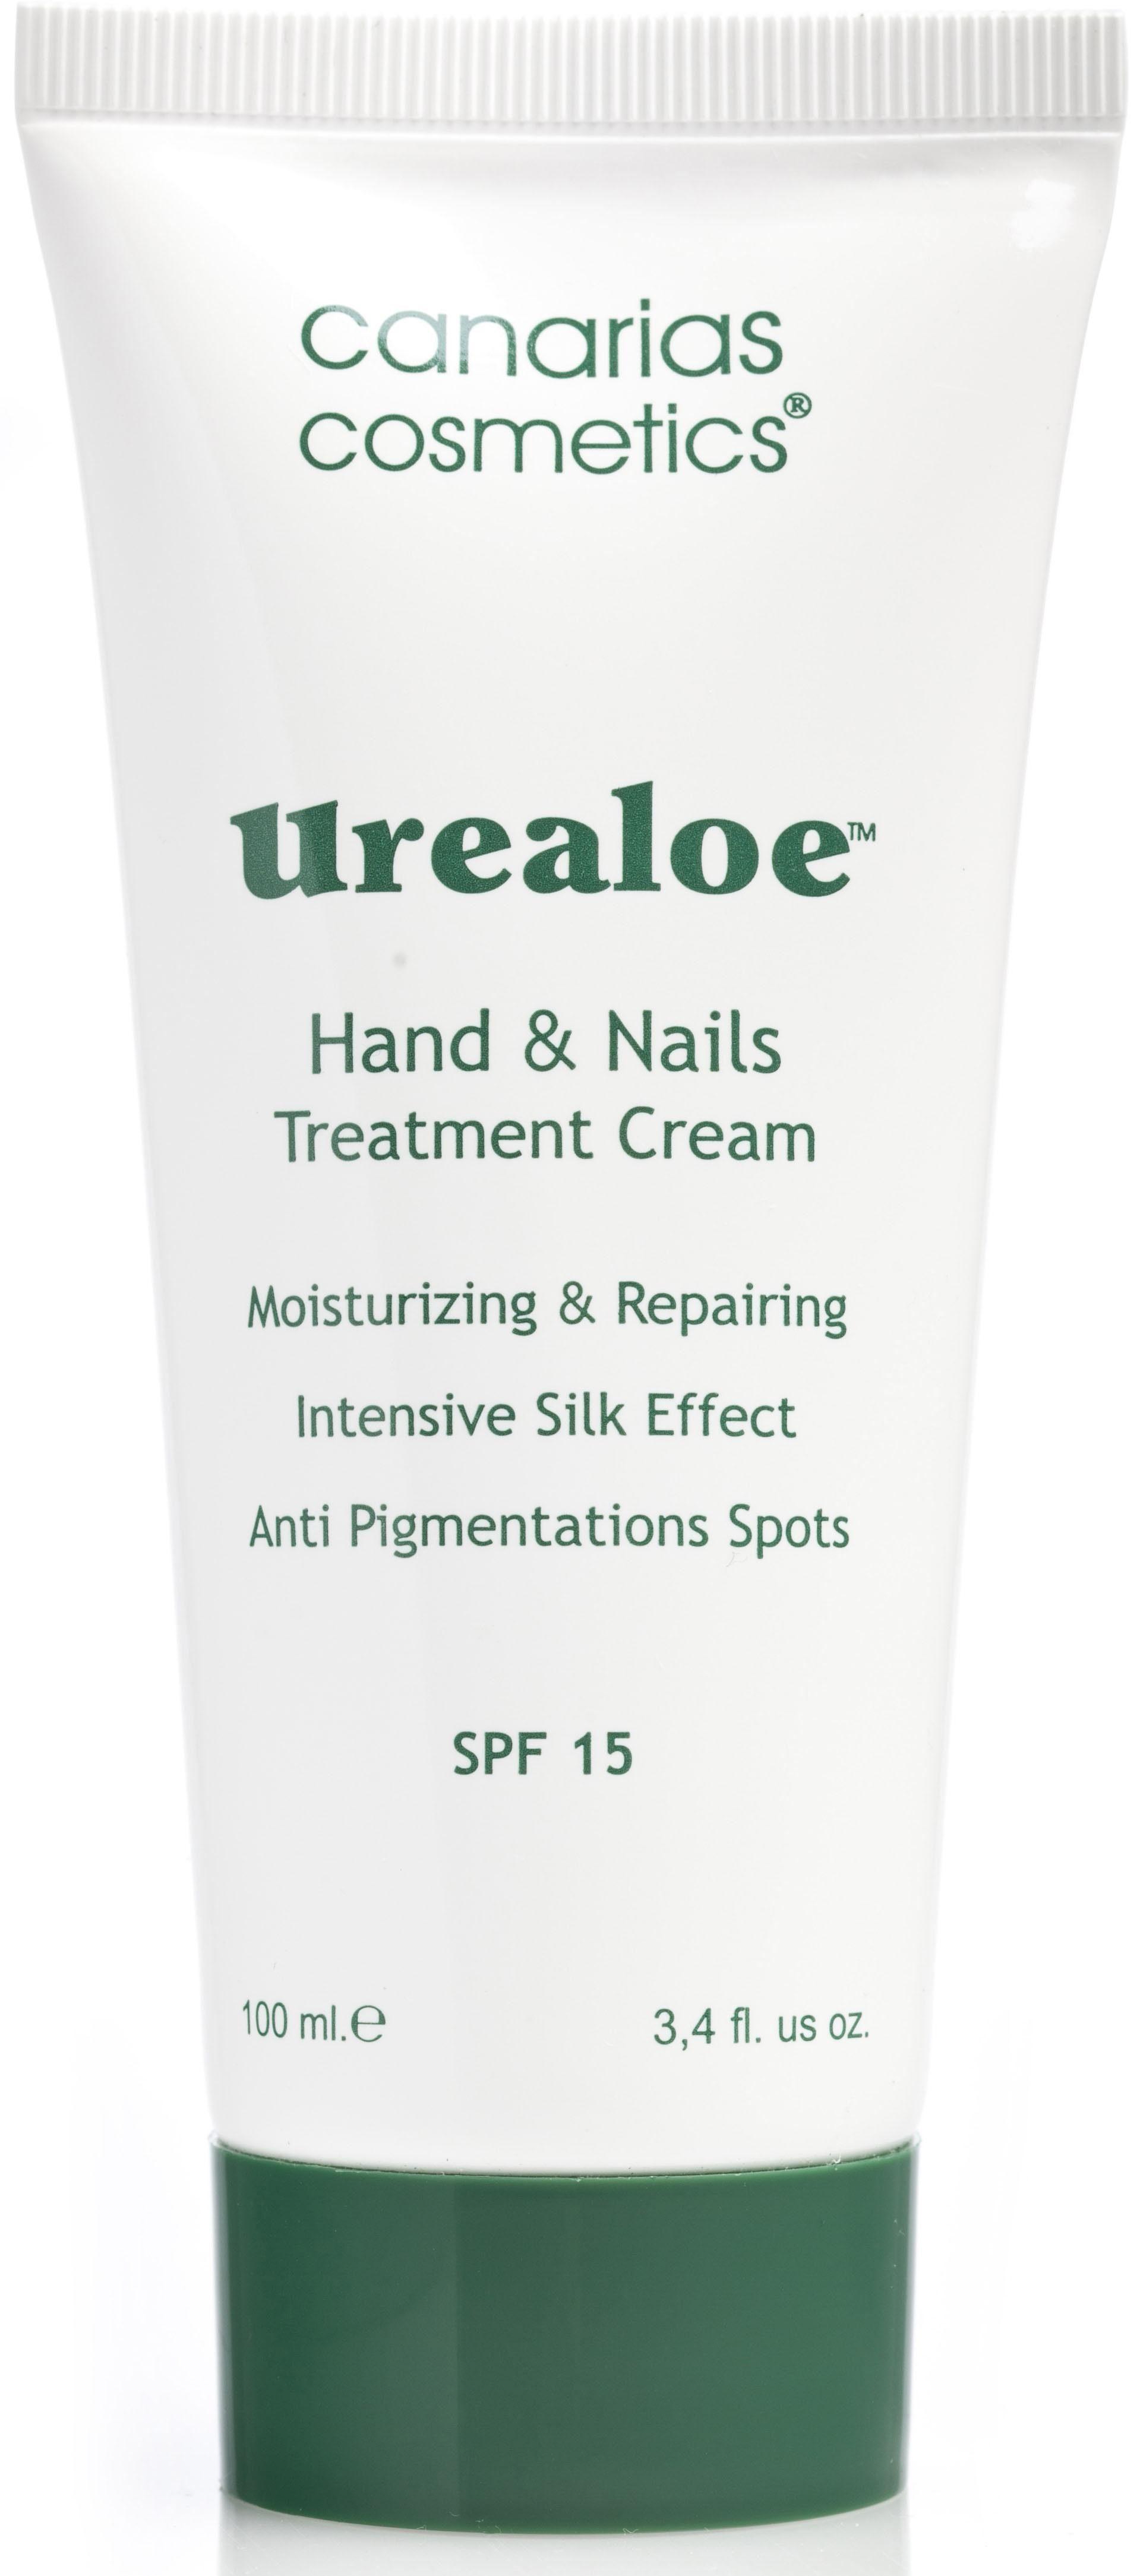 Canarias Cosmetics, »Urealoe - Handcreme«, Hand- und Nagelpflege